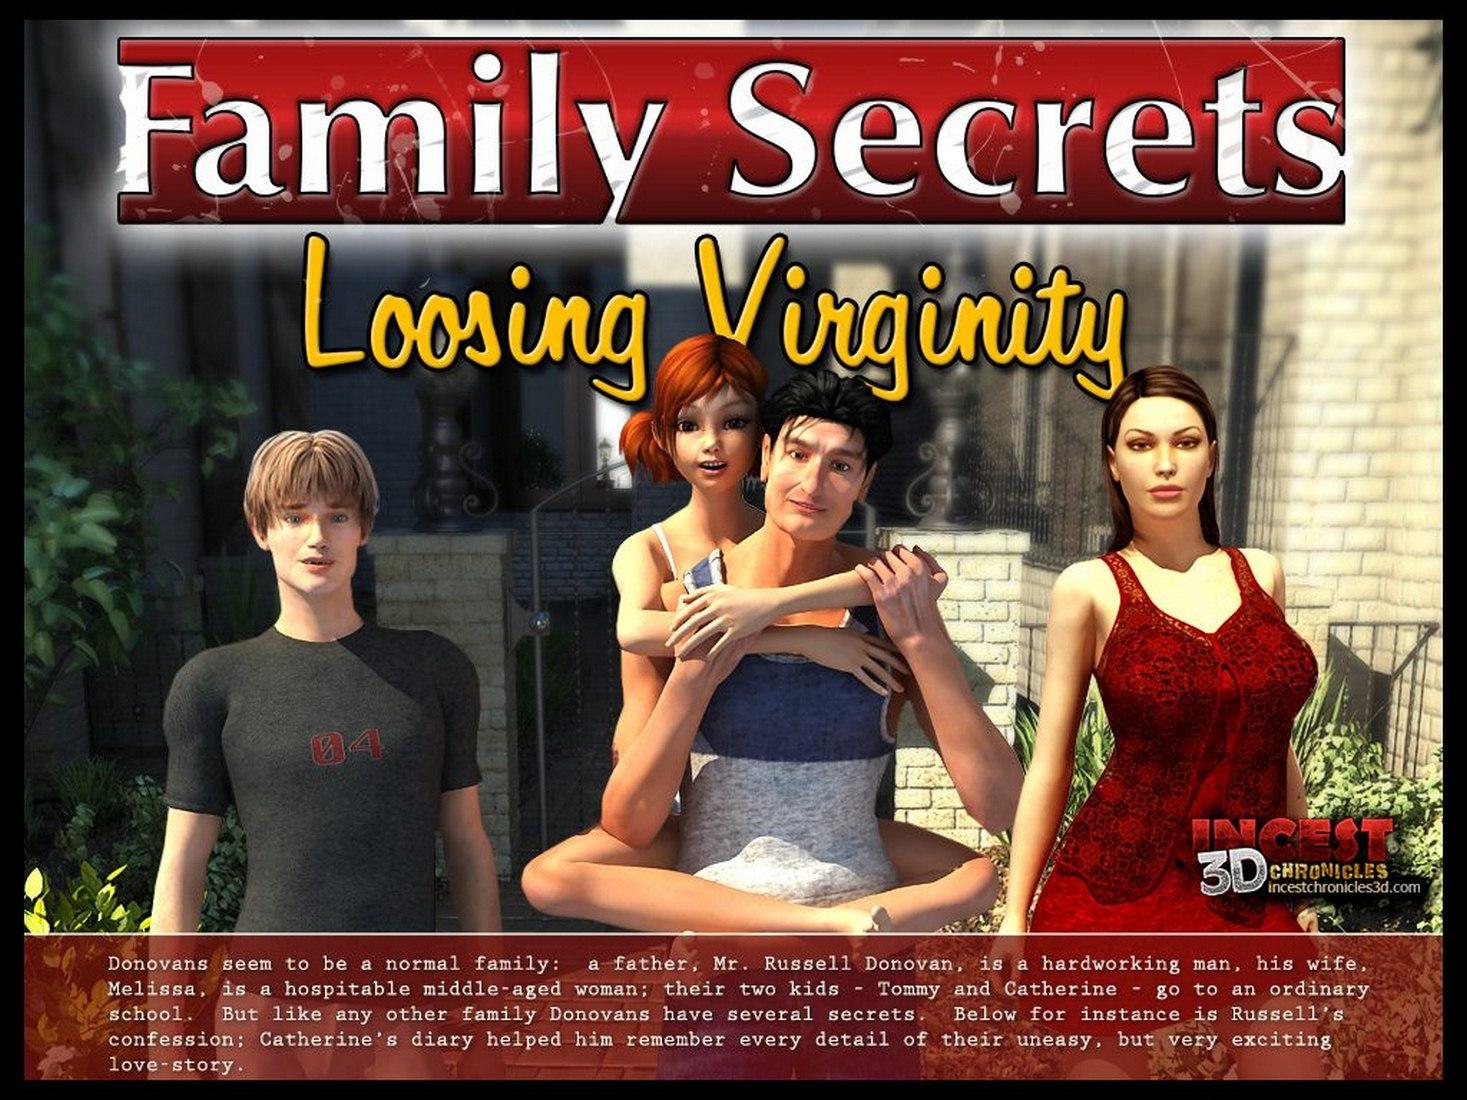 Family Secrets-Loosing Veginity image 01